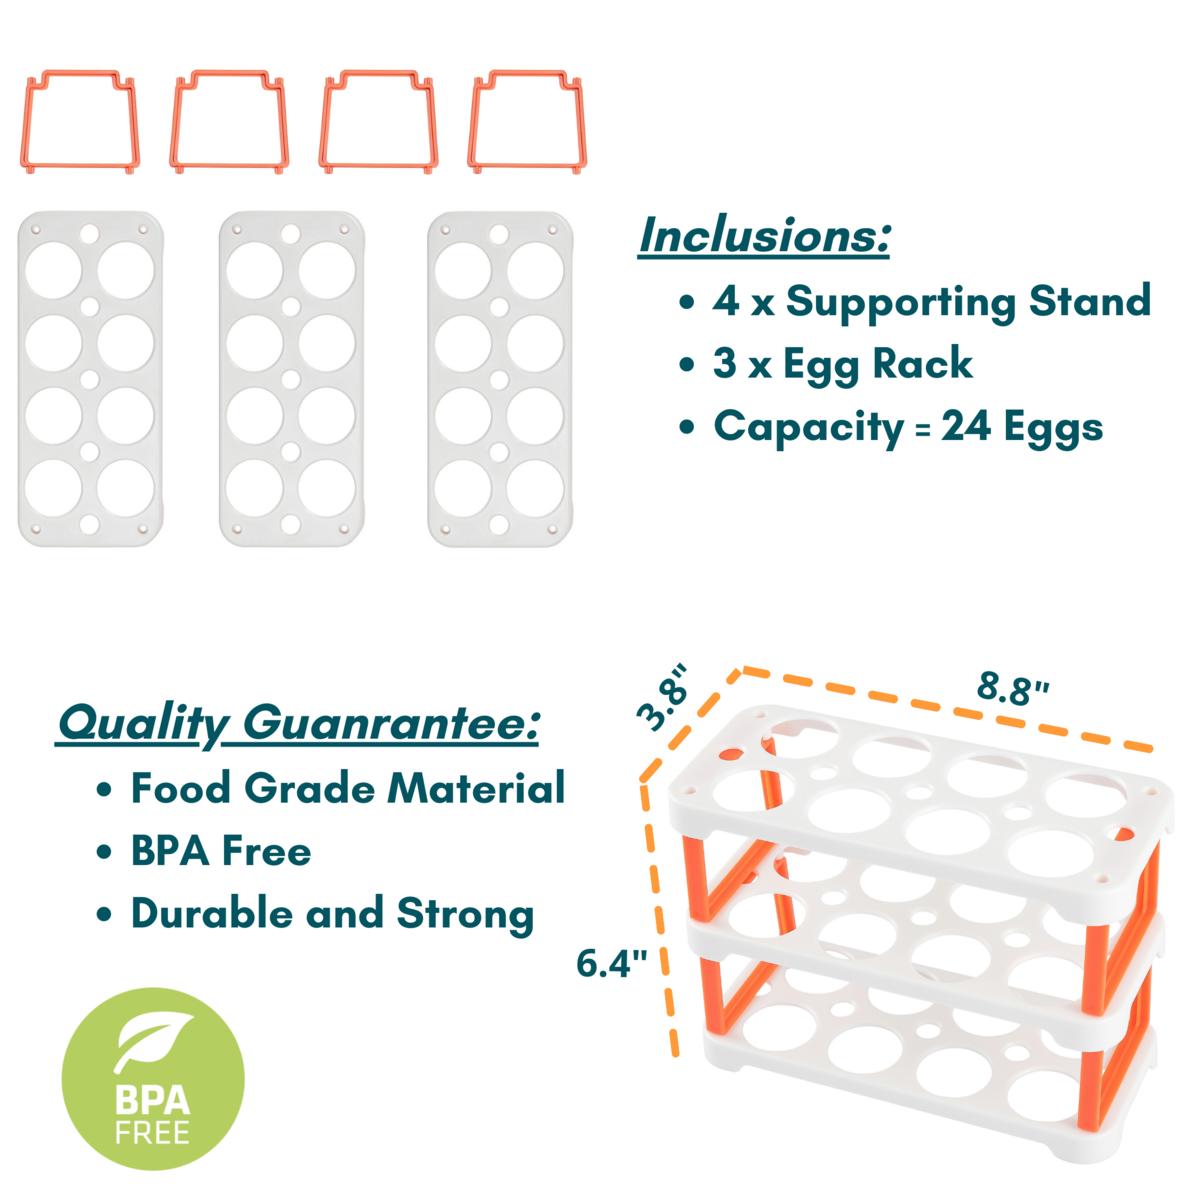 Ease.Life Egg Holder for Refrigerator - 3 Stackable Egg Rack - 24 Eggs - Color White